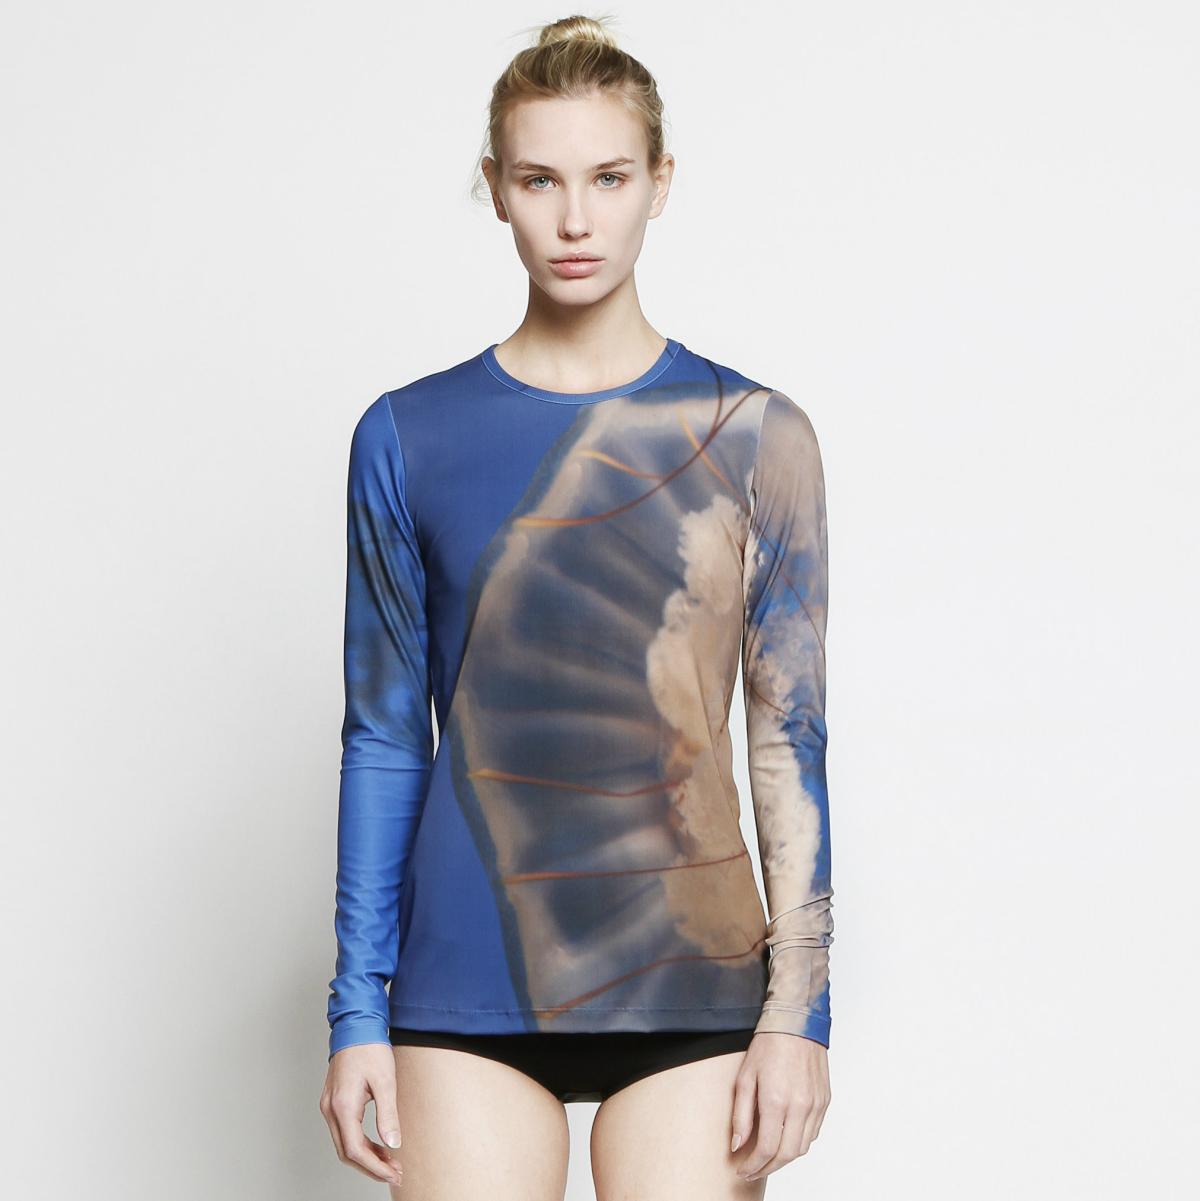 Cover jellyfish long sleeve top at TenOverSix